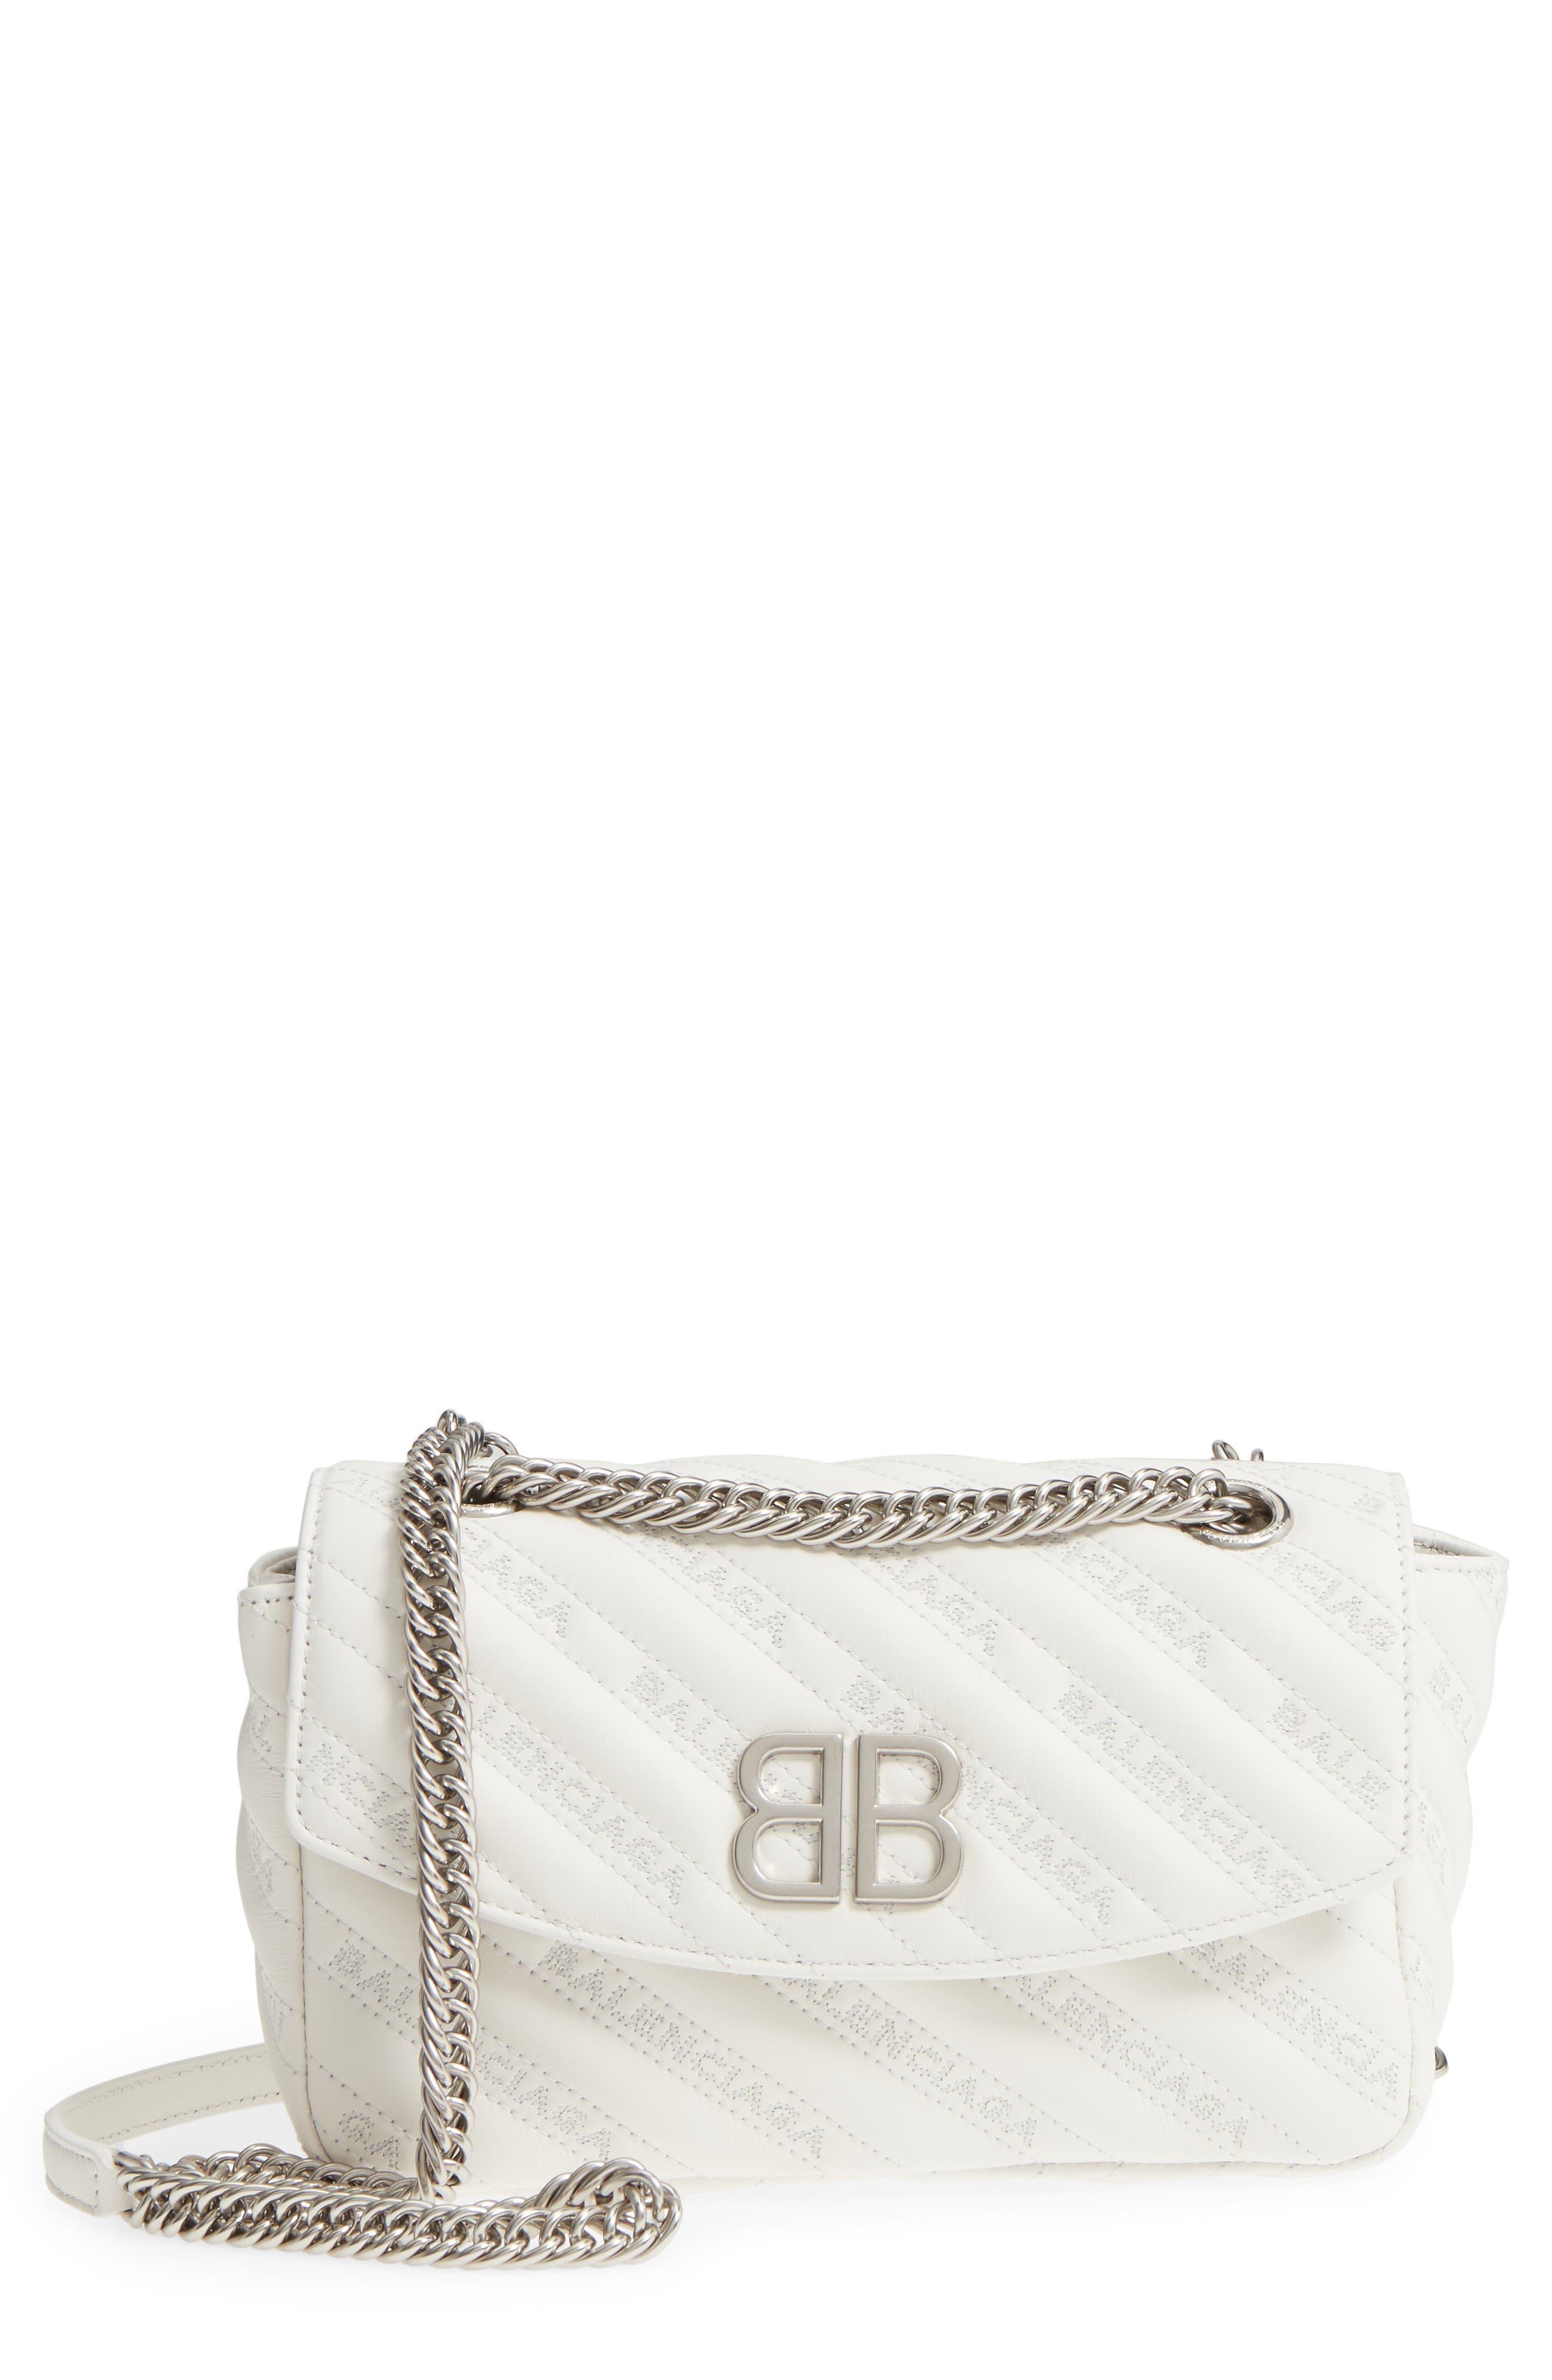 Balenciaga Small Matelassé Leather Shoulder Bag